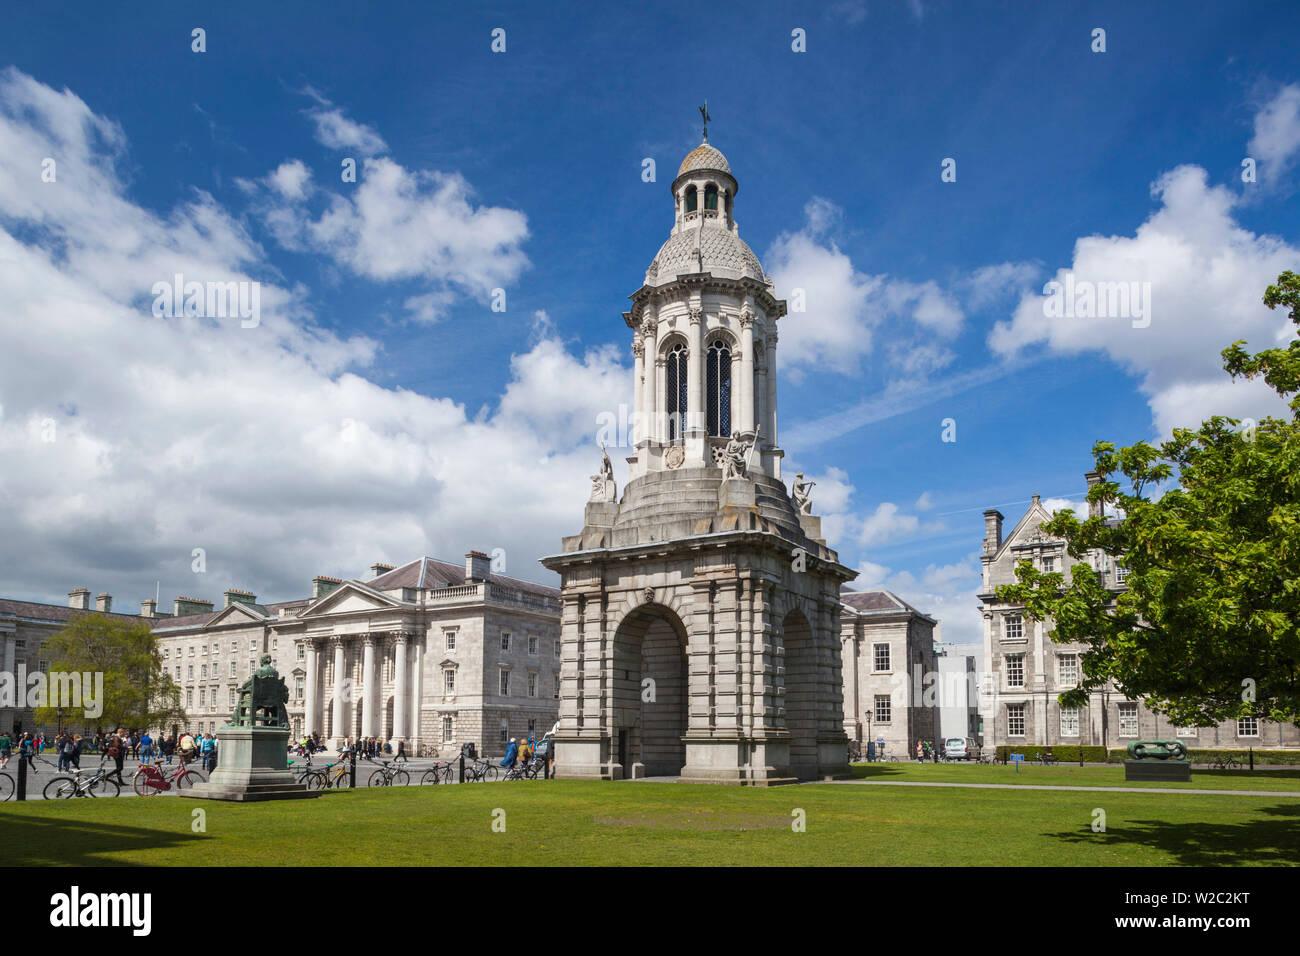 Ireland, Dublin, Trinity College, Parliament Square and Campanile - Stock Image